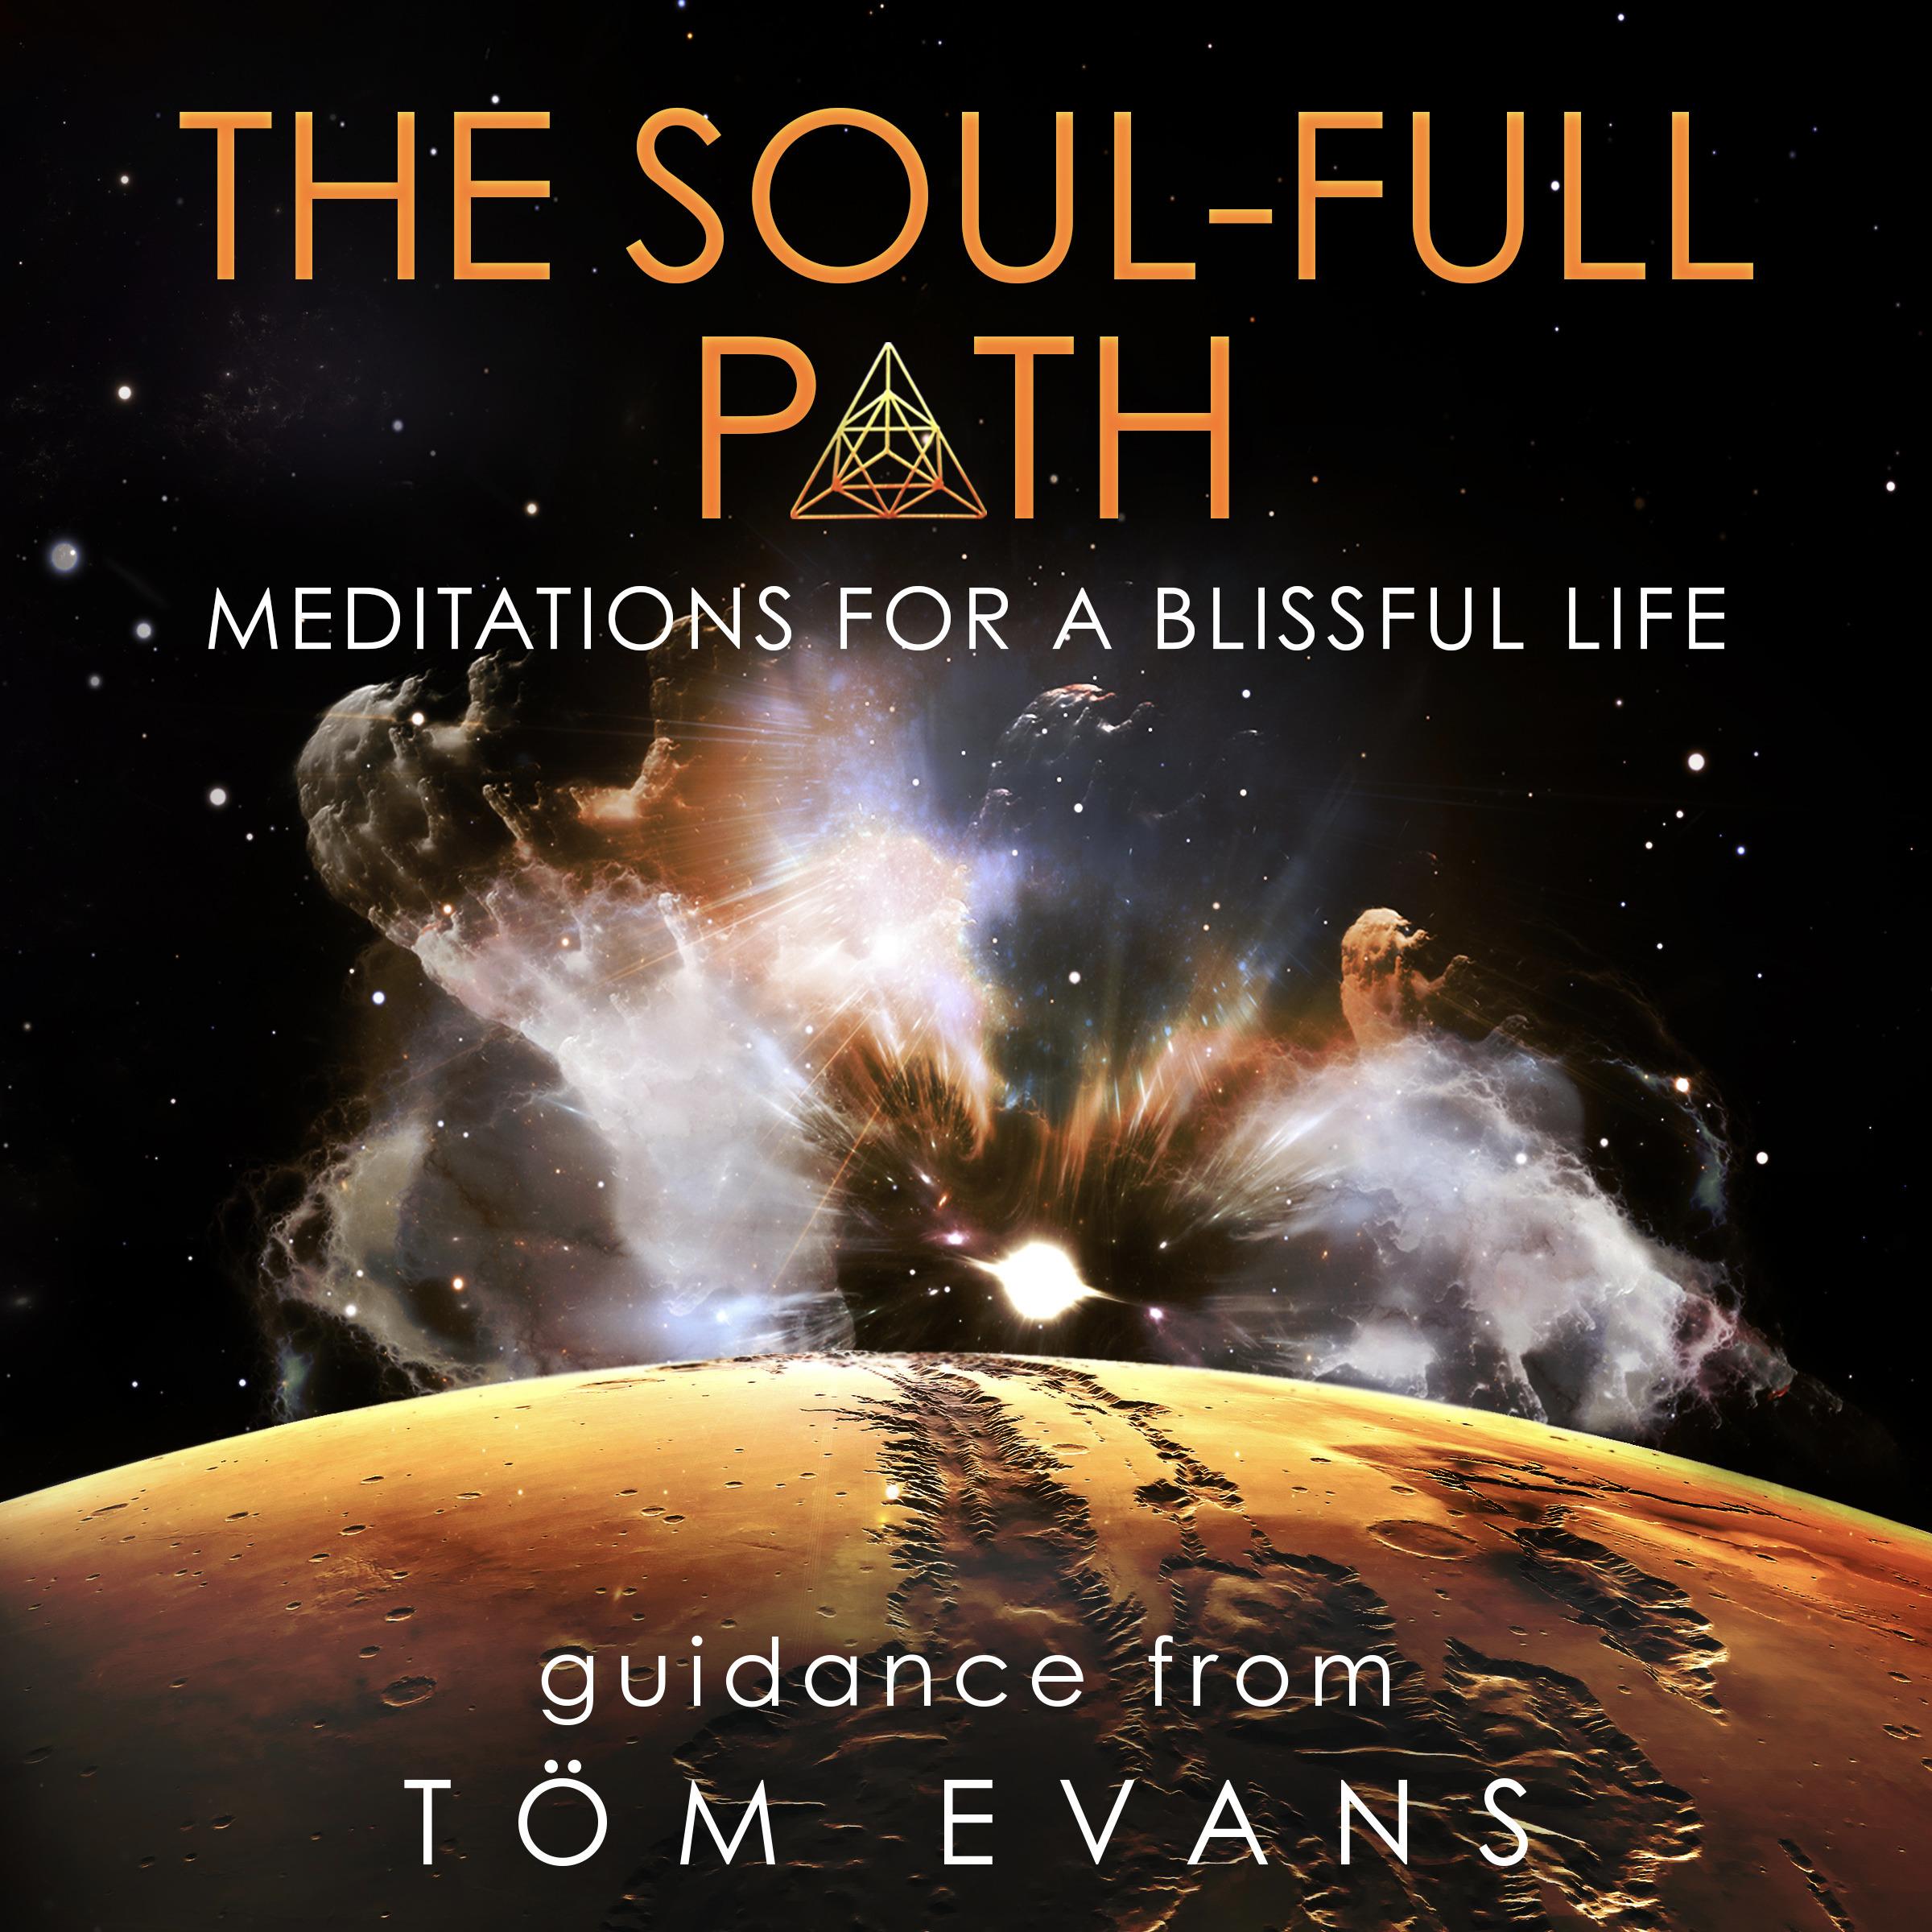 The Soul-full Path